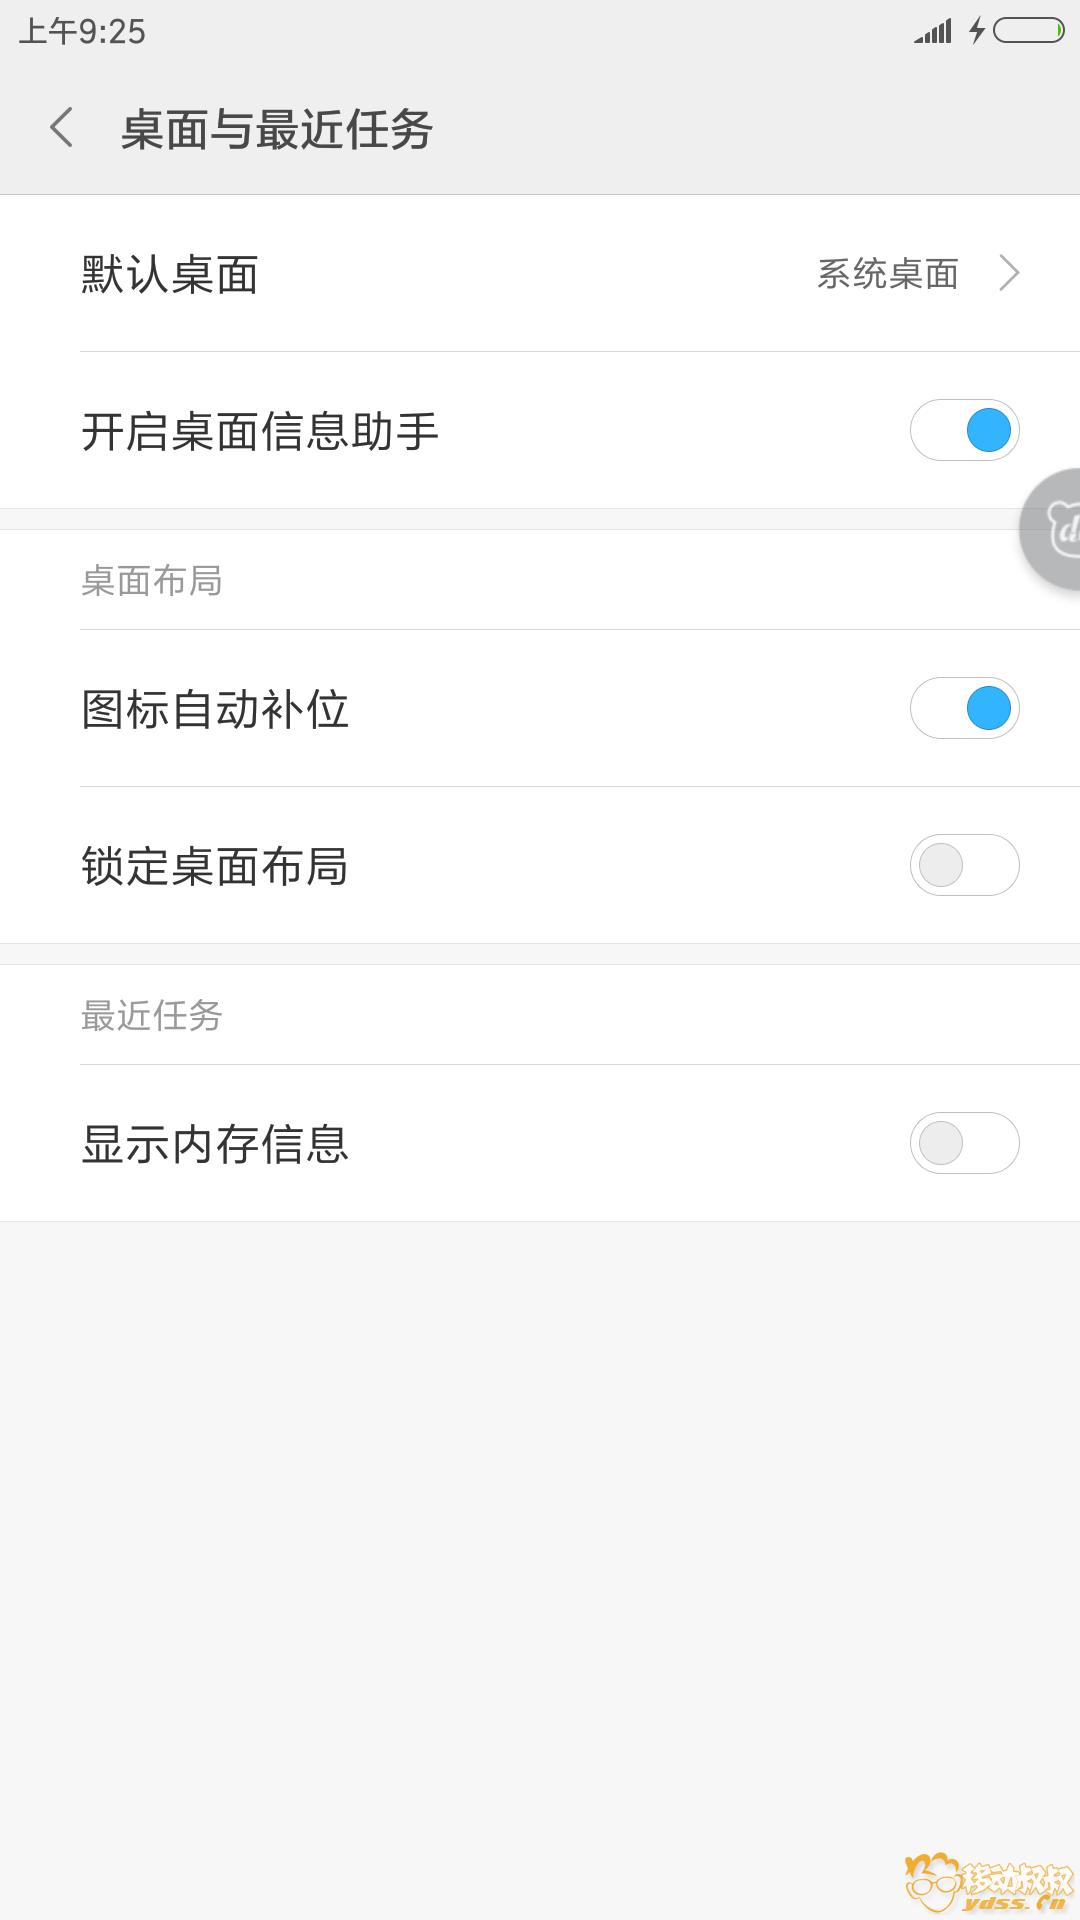 Screenshot_2018-02-12-09-25-13-195_com.android.settings.png